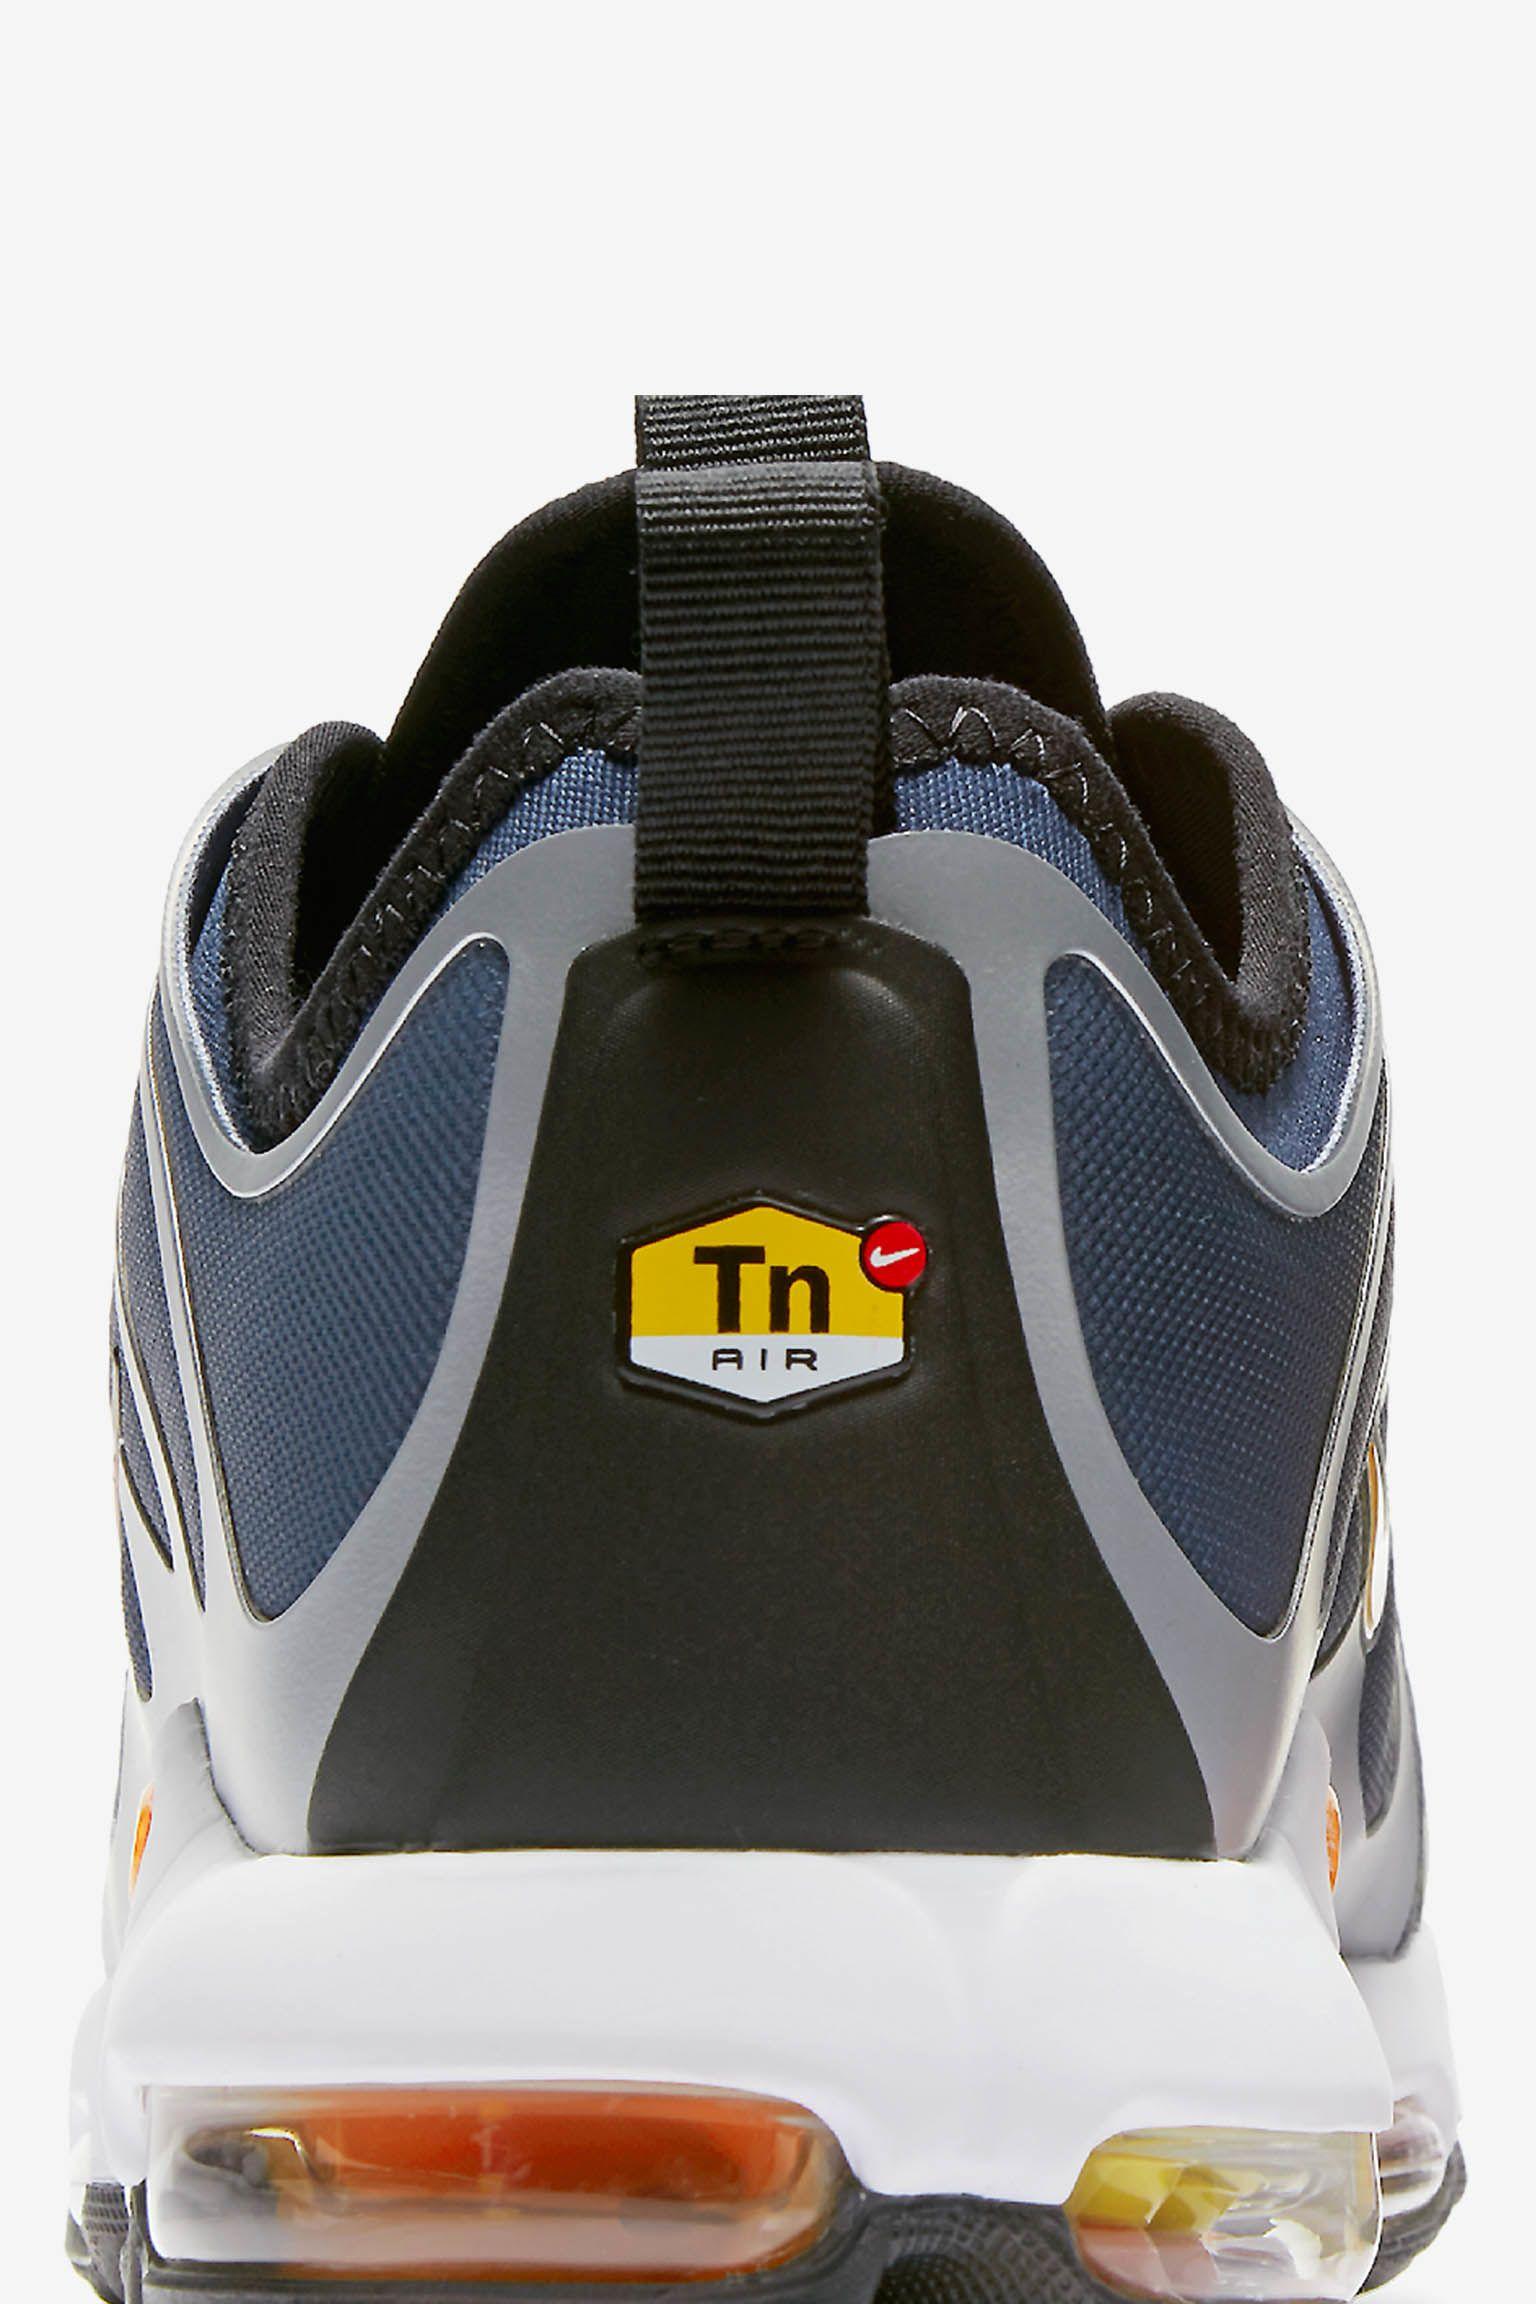 Date de sortie de la Nike Air Max Plus Tn Ultra « Blue Grey ...